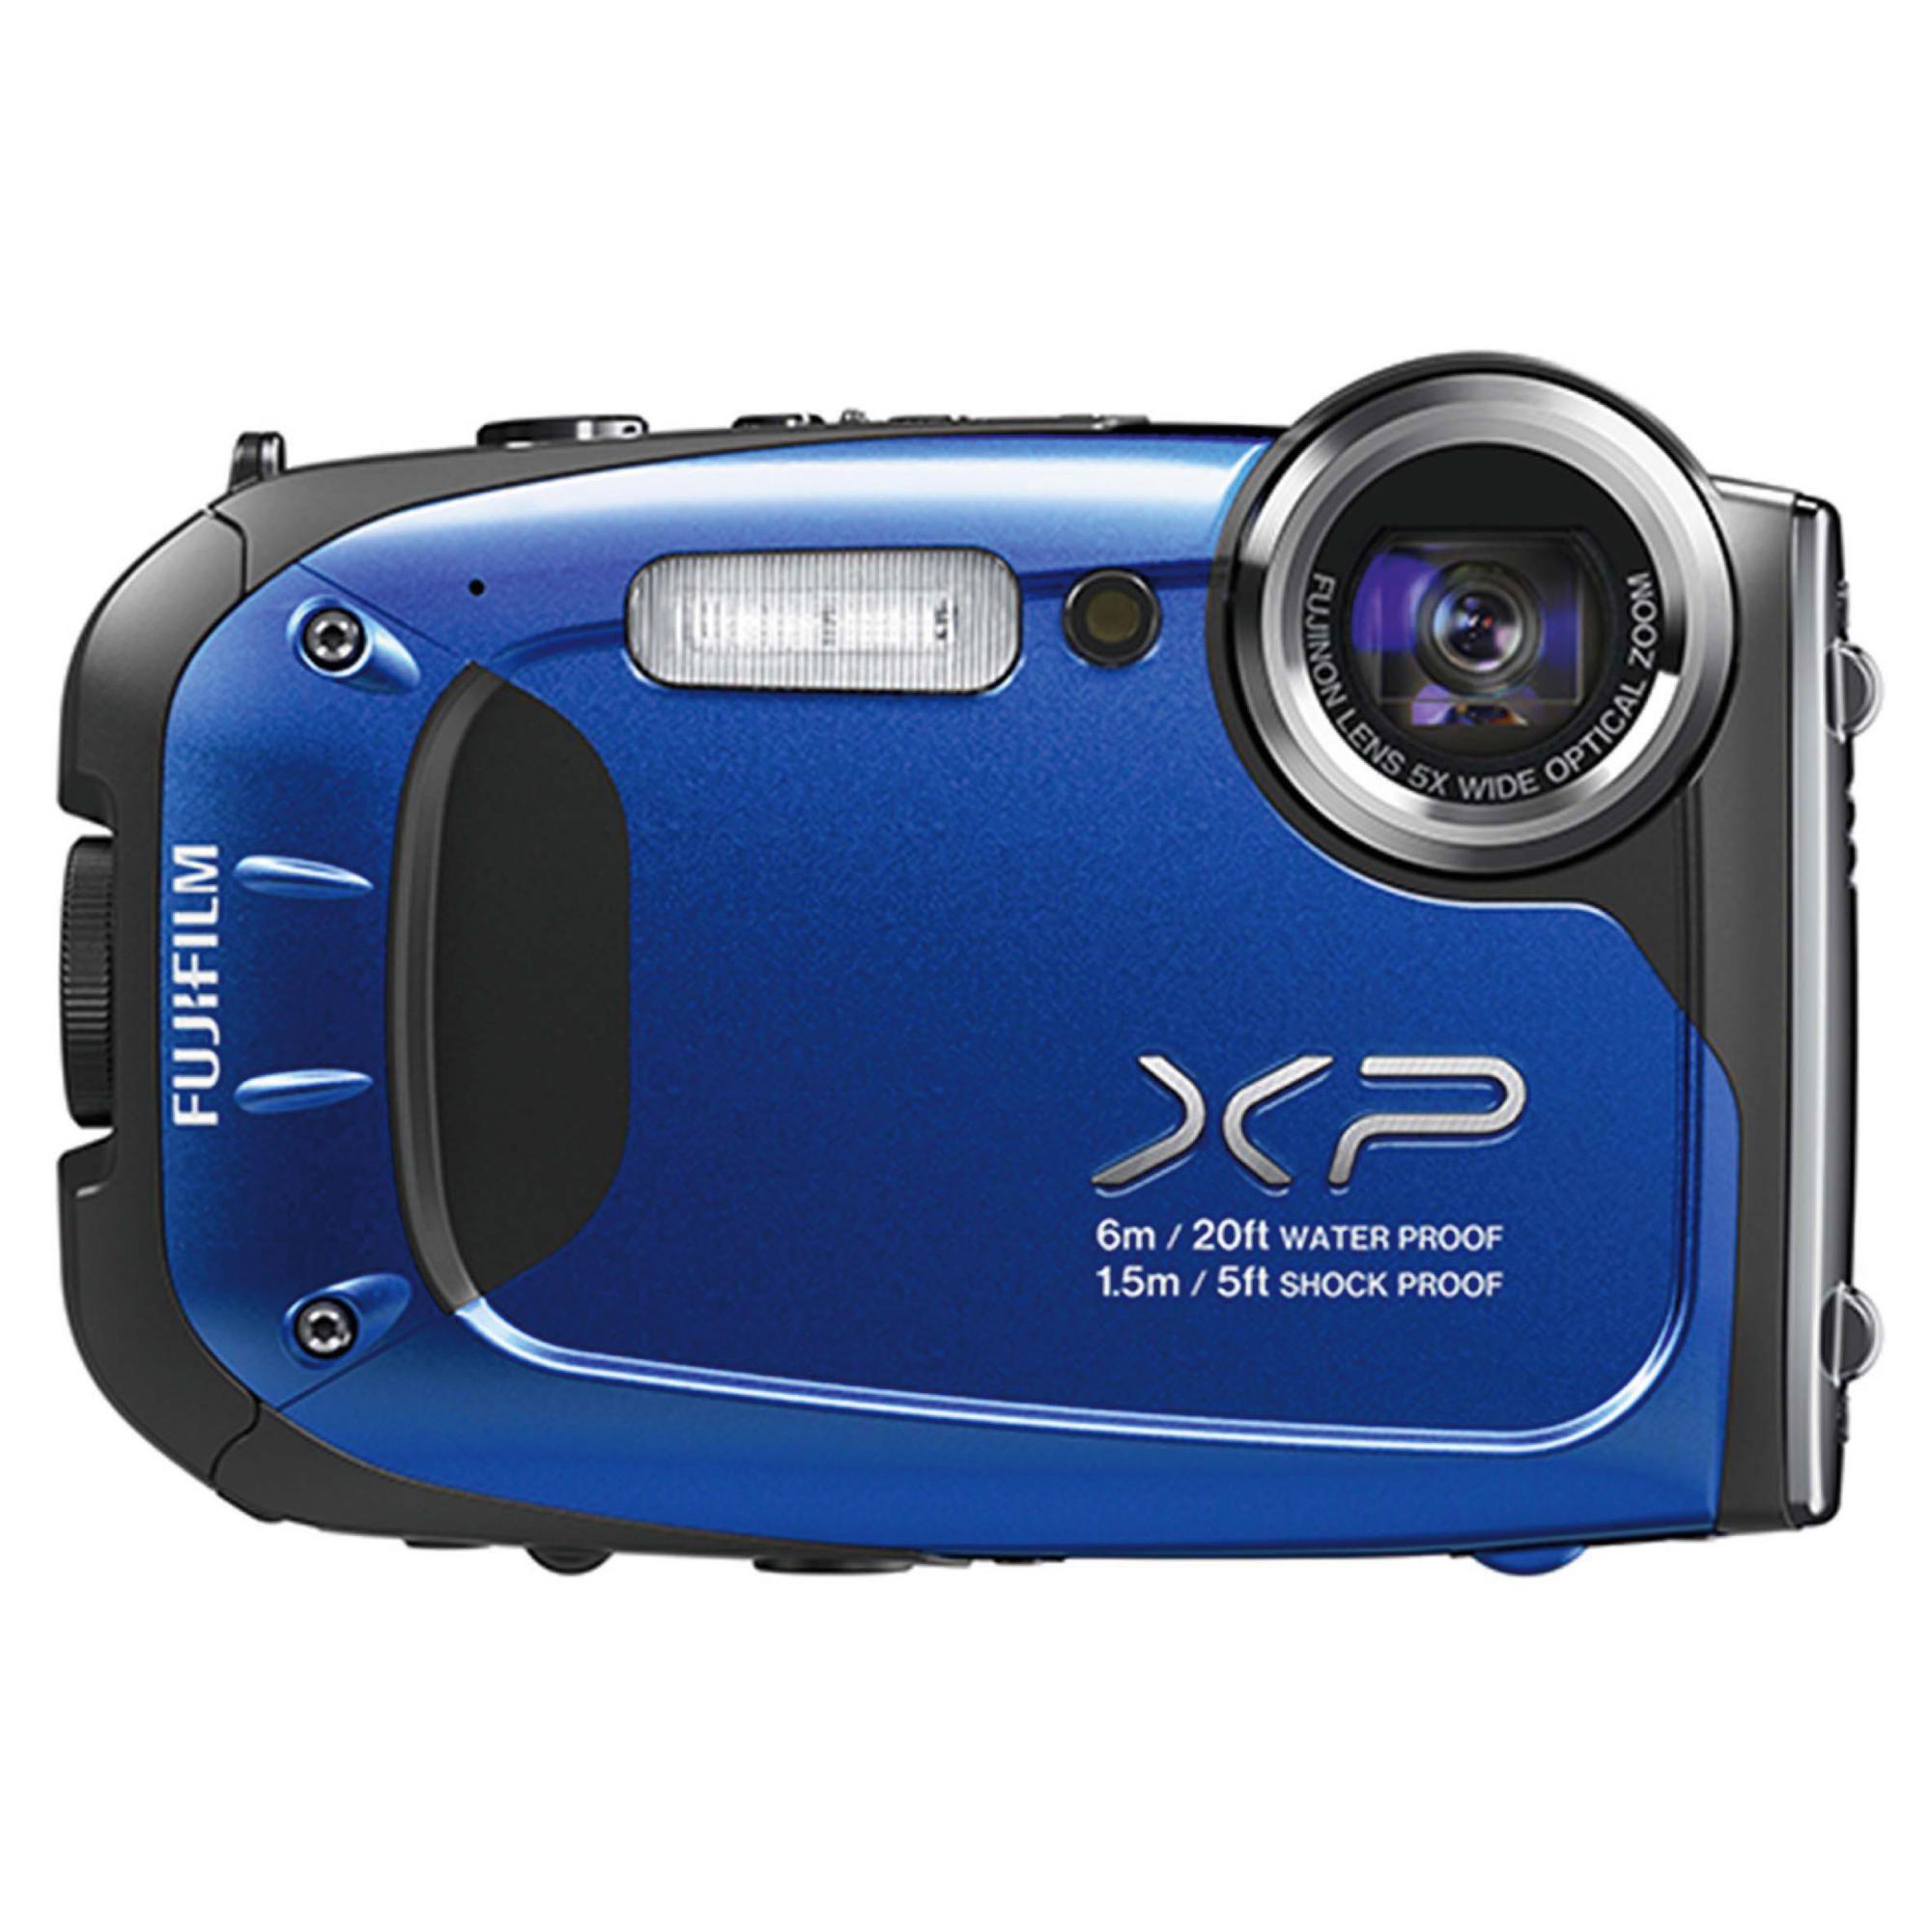 Fujifilm XP60 Tough Digital Camera, Blue, 16MP, 5x Optical Zoom, 2.7 inch LCD Screen